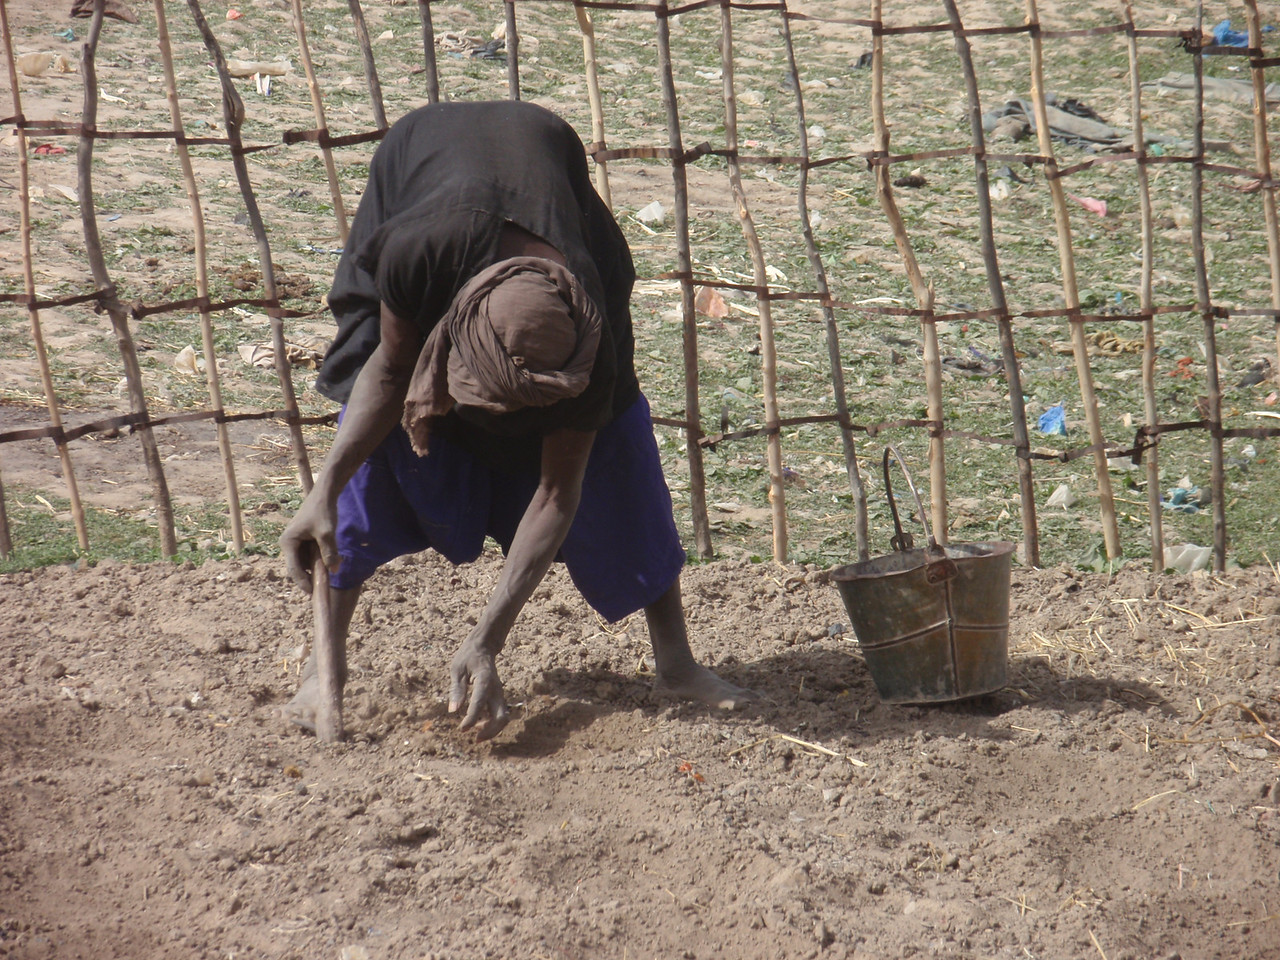 257_Mopti  The Fula Quarter  Woman Planting Seeds